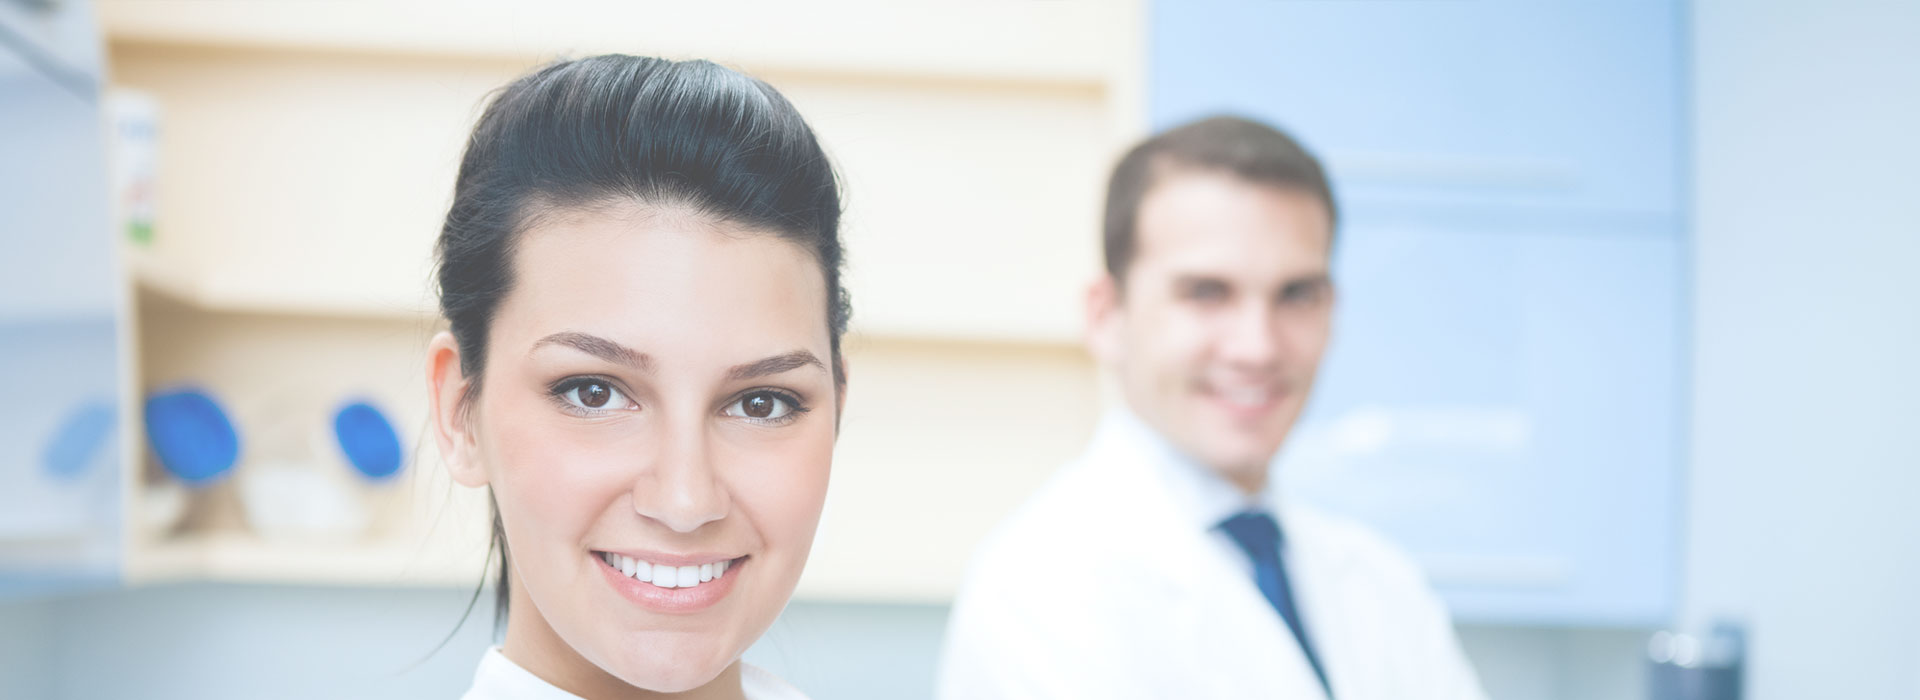 Dentist smiling at dental